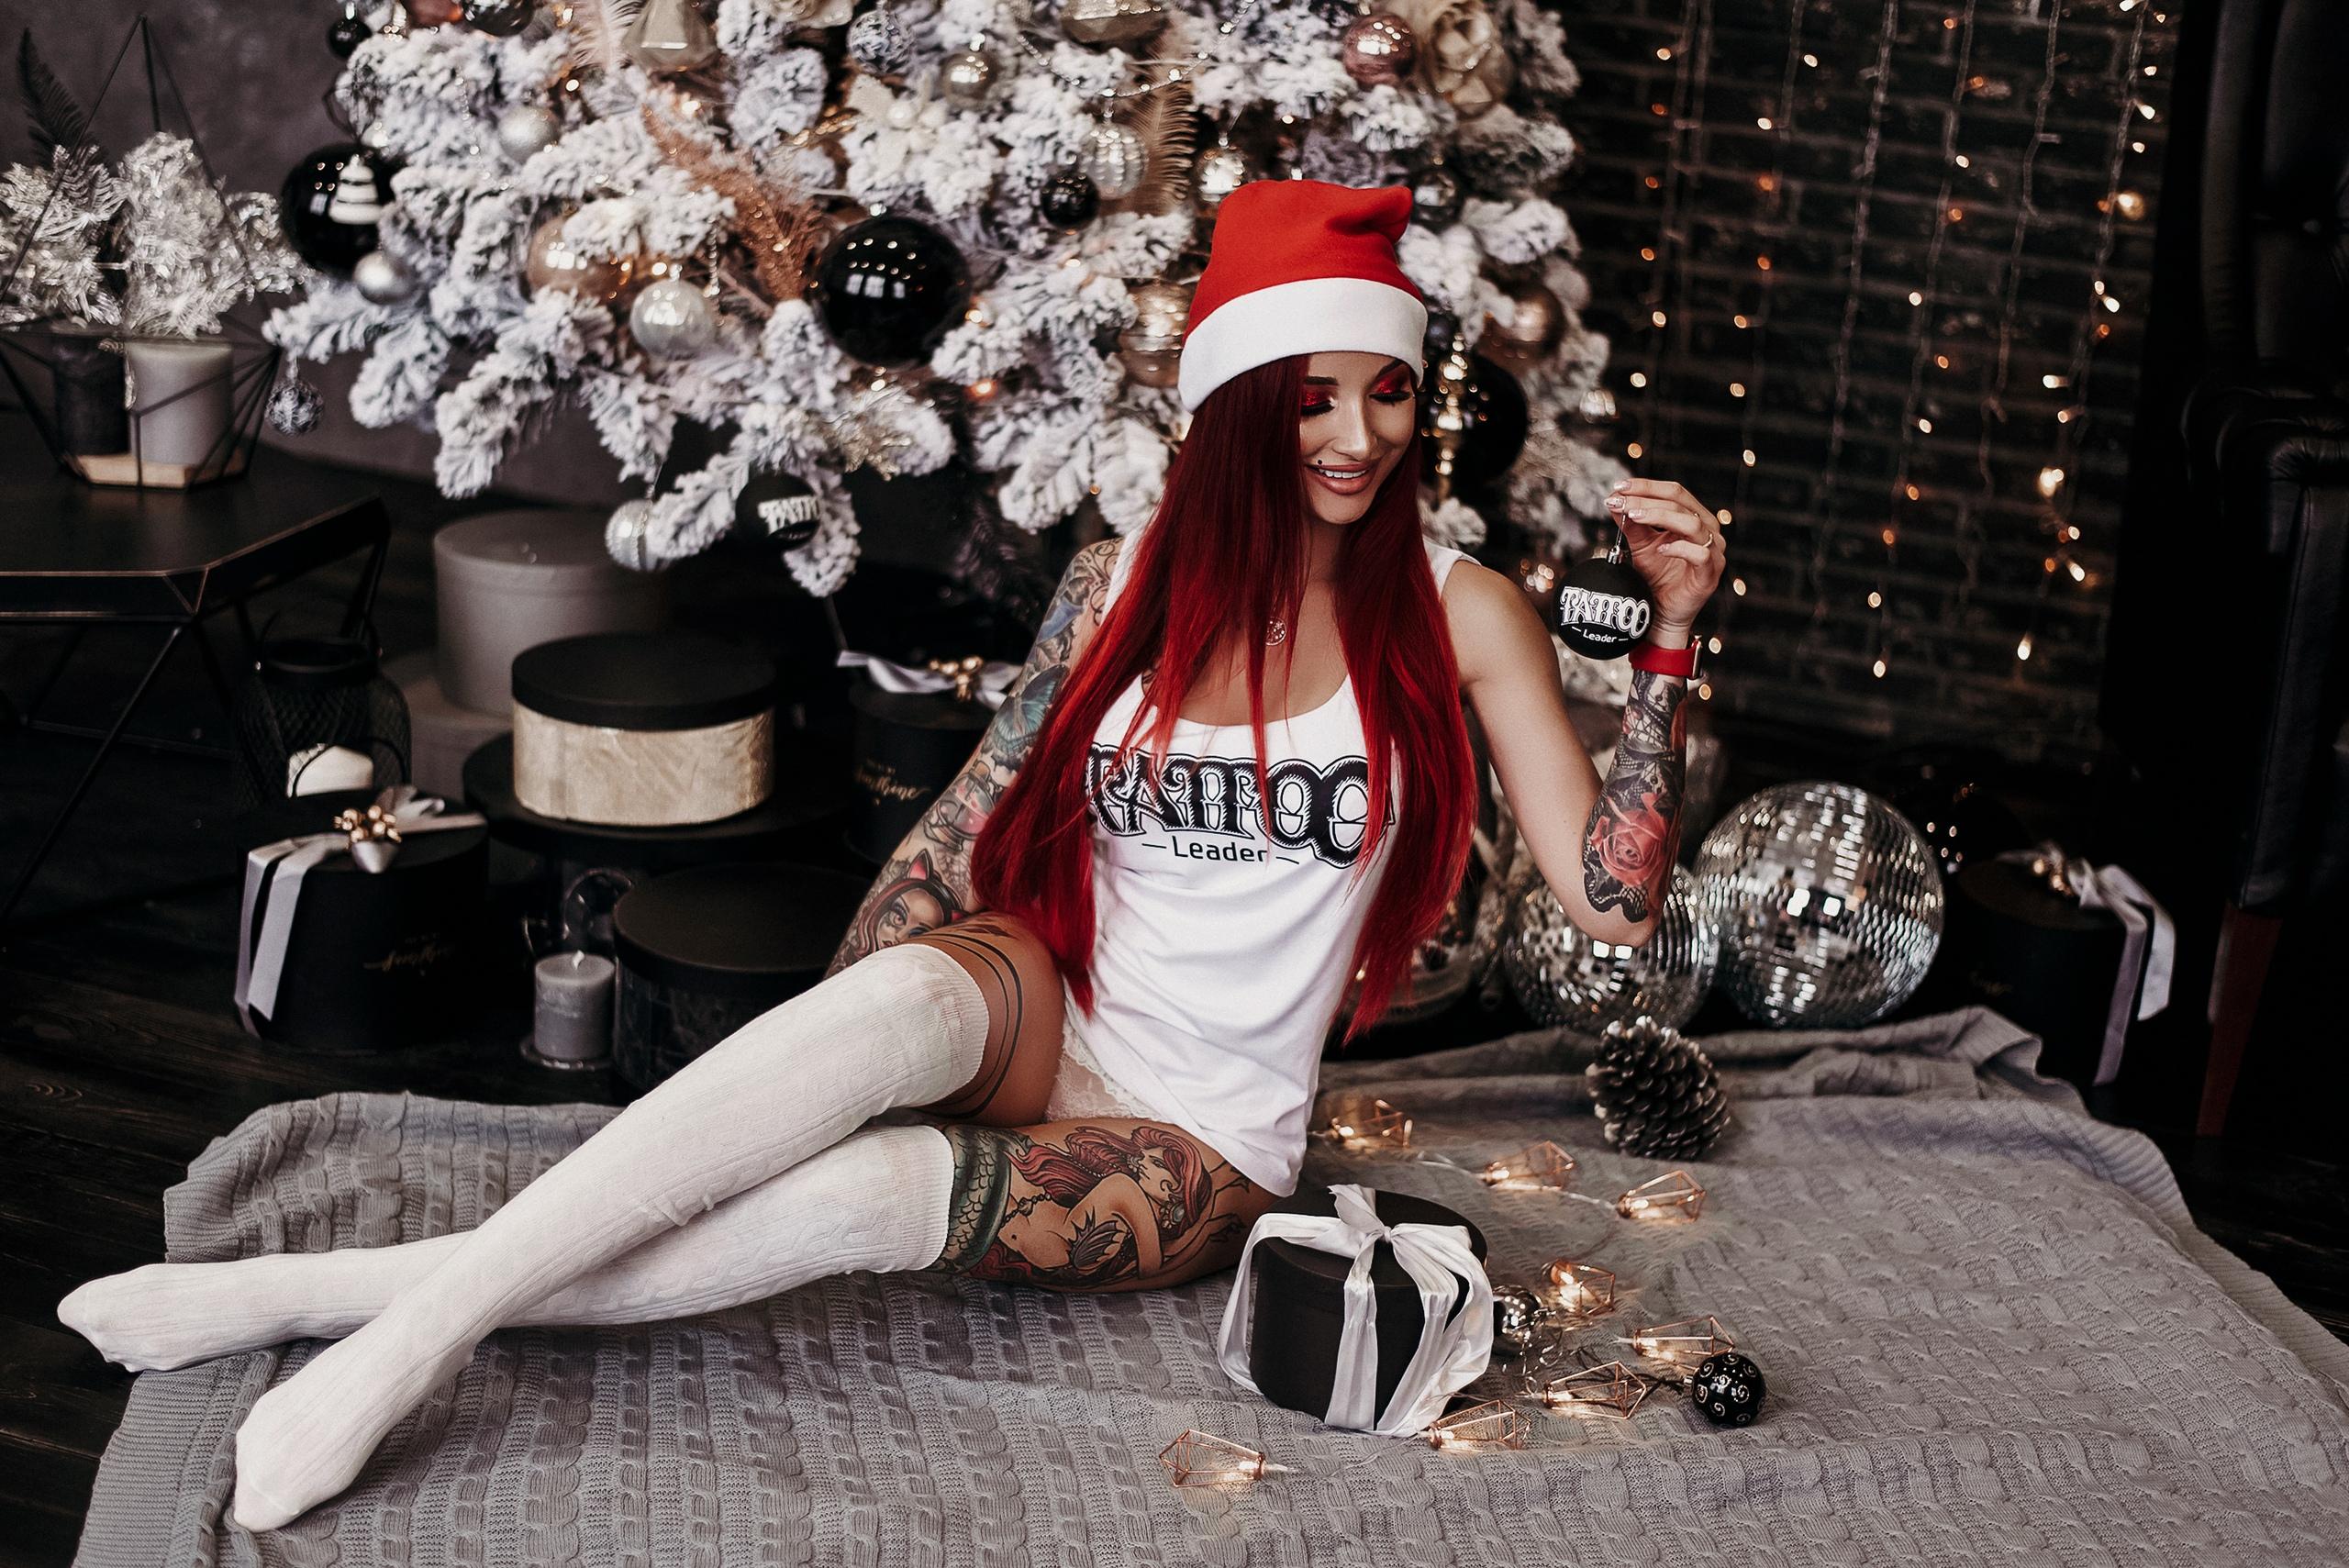 against-redhead-christmas